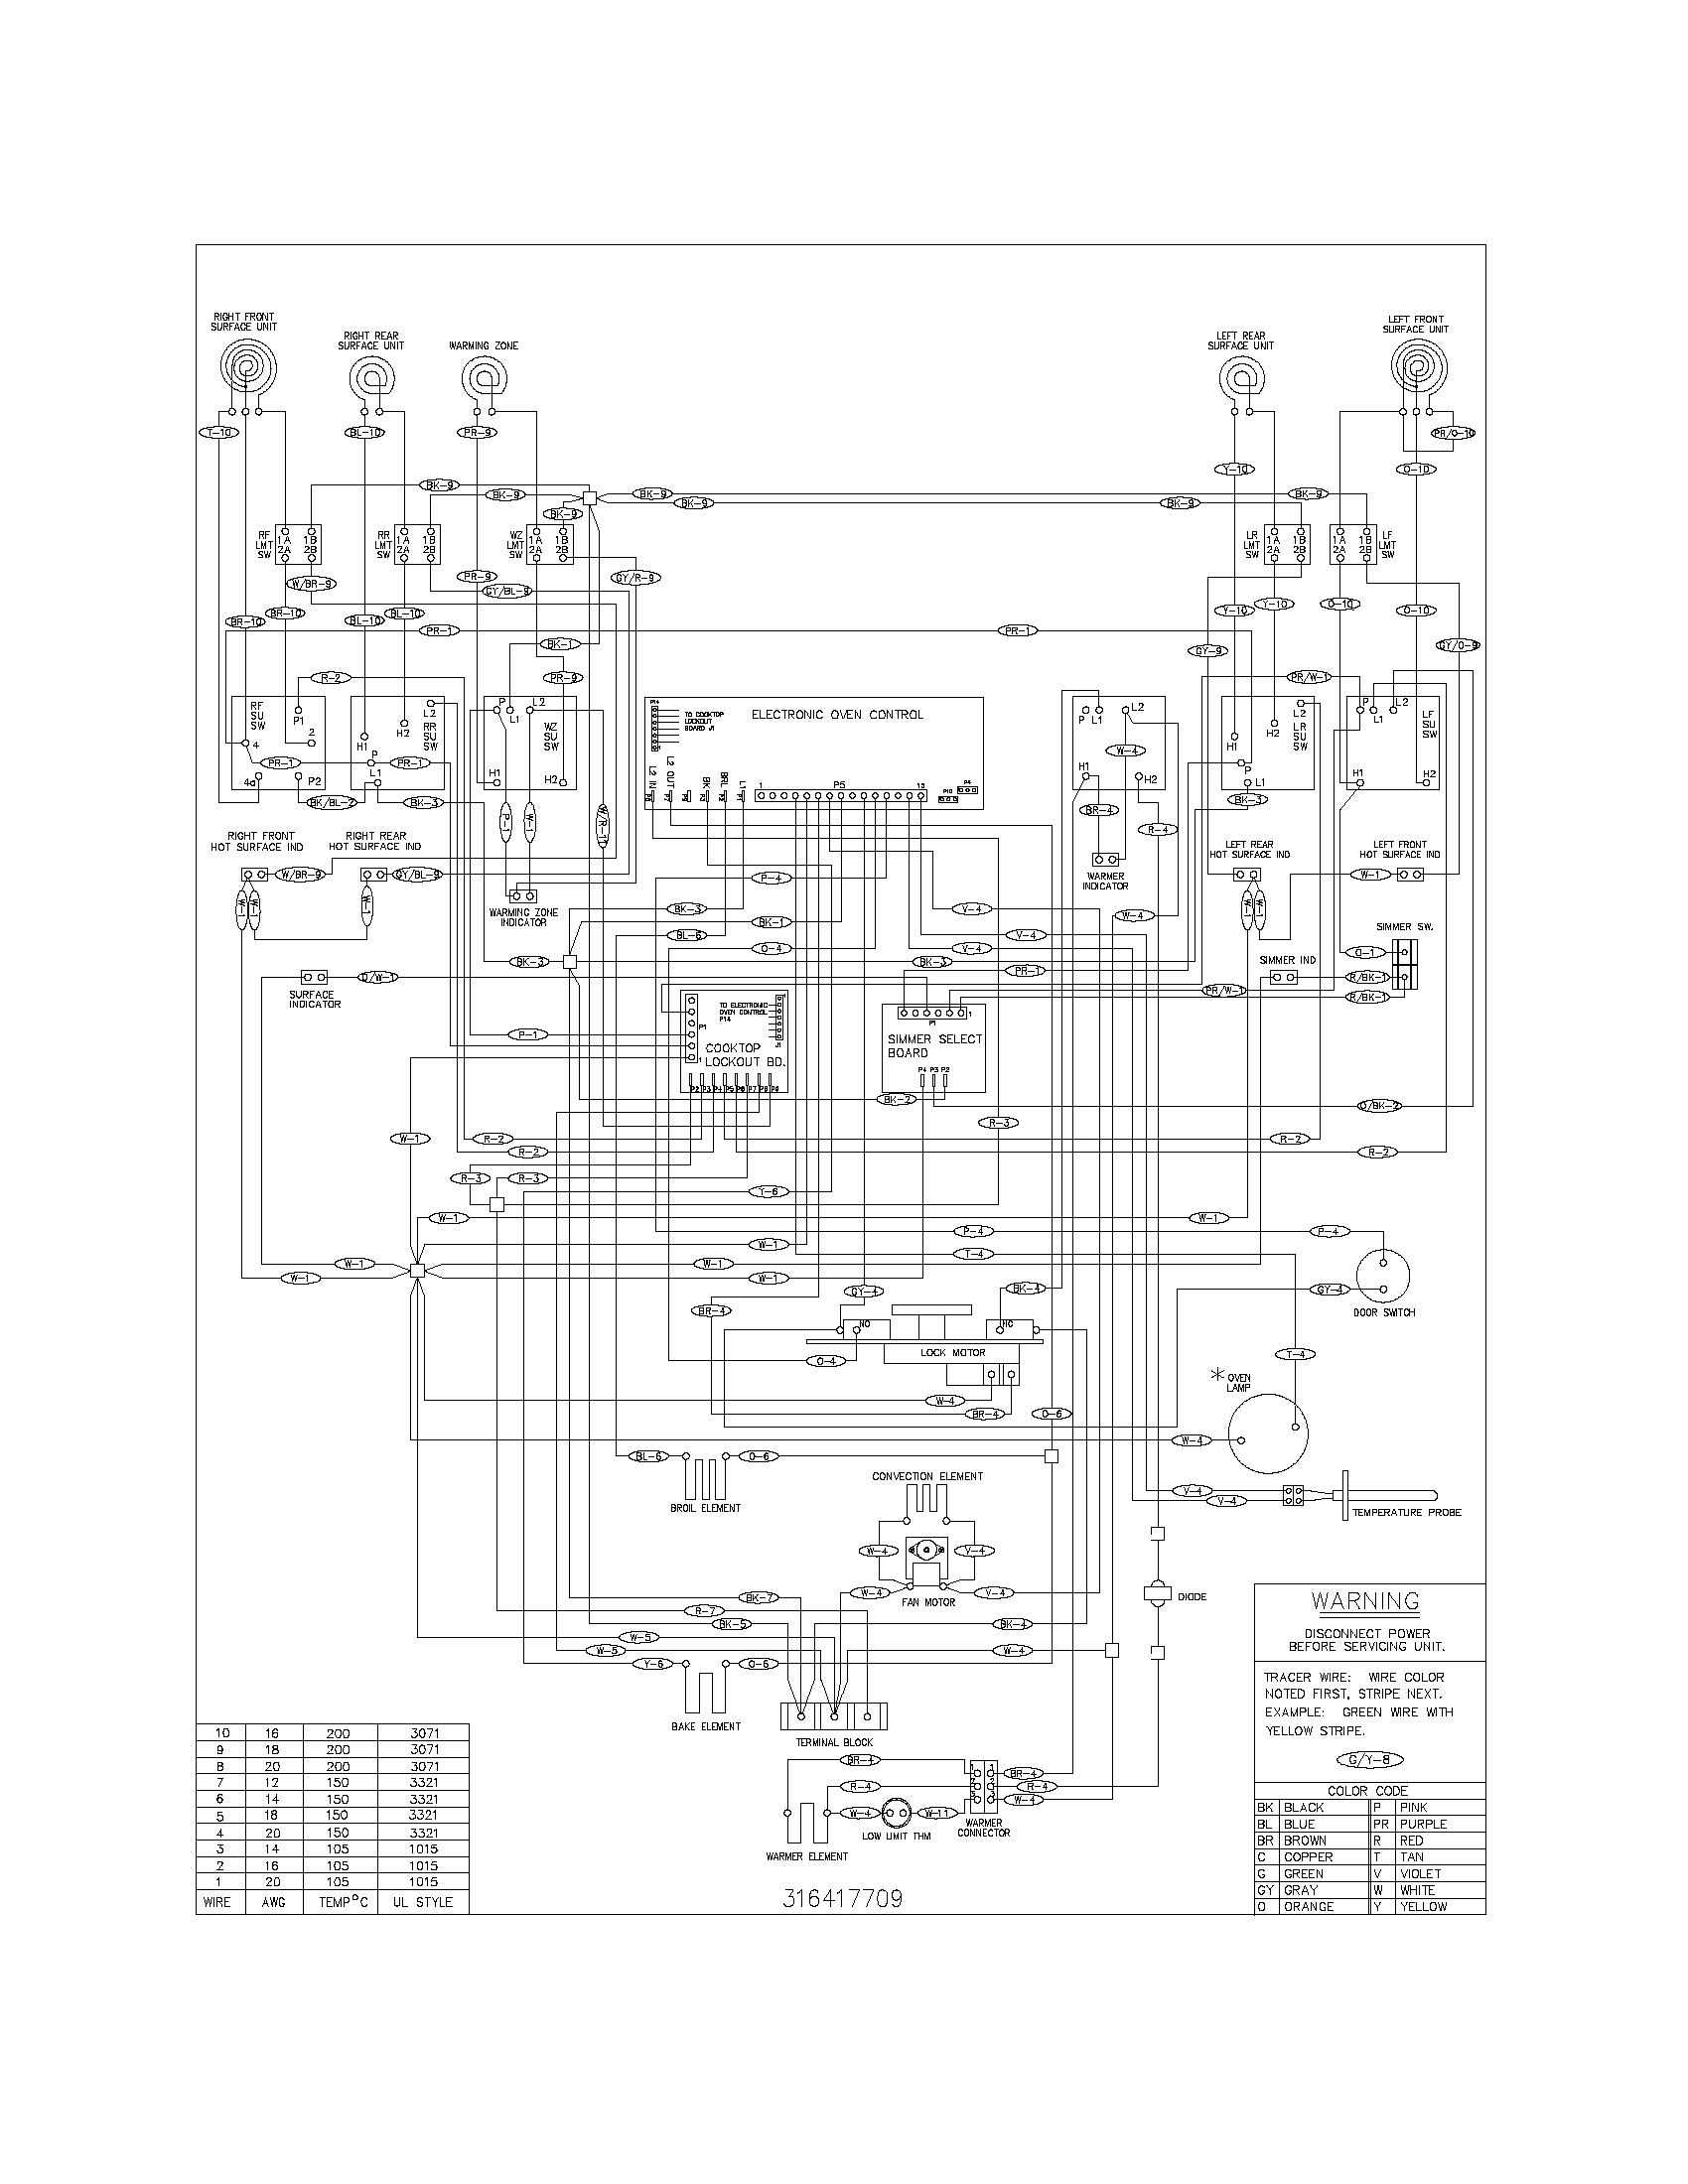 Schematics Dishwasher Wiring Whirlpool Dul300tkqo - Wiring Diagrams ...